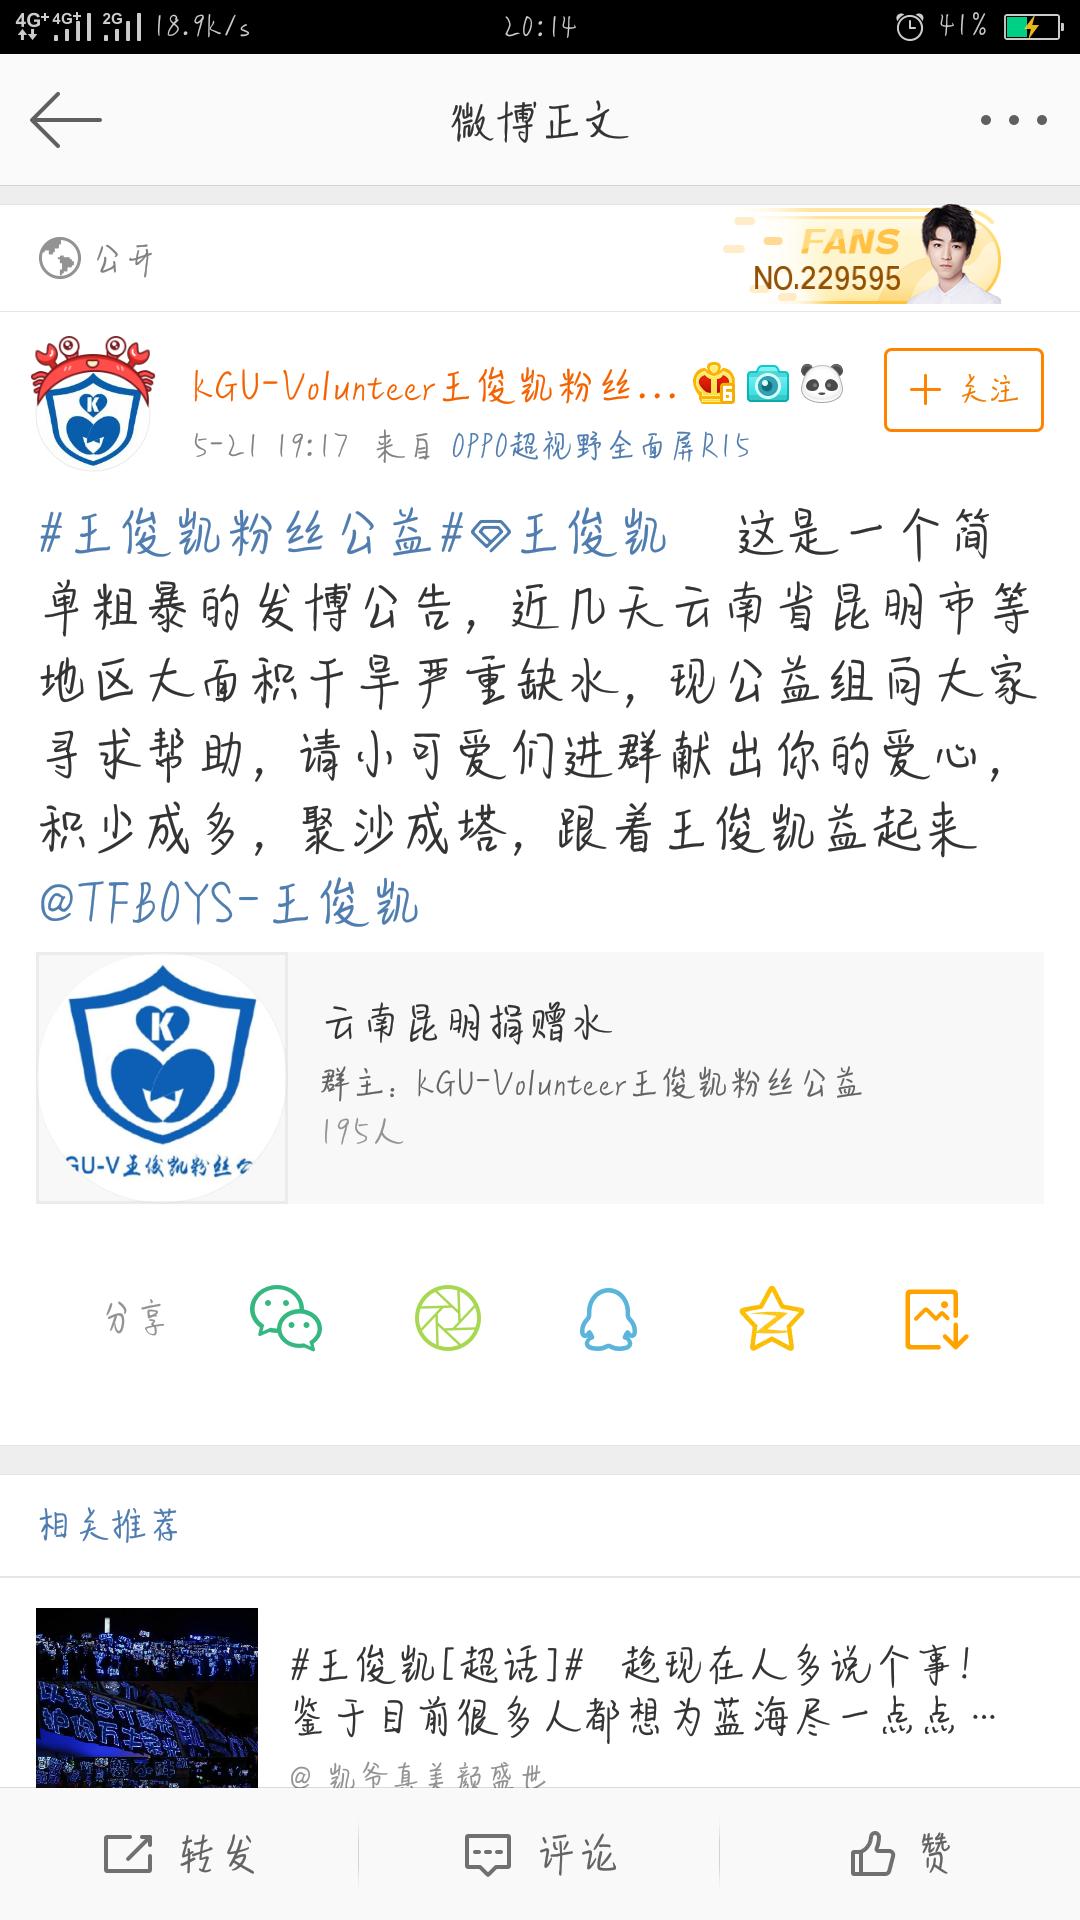 http://www.qwican.com/yuleshishang/1092829.html